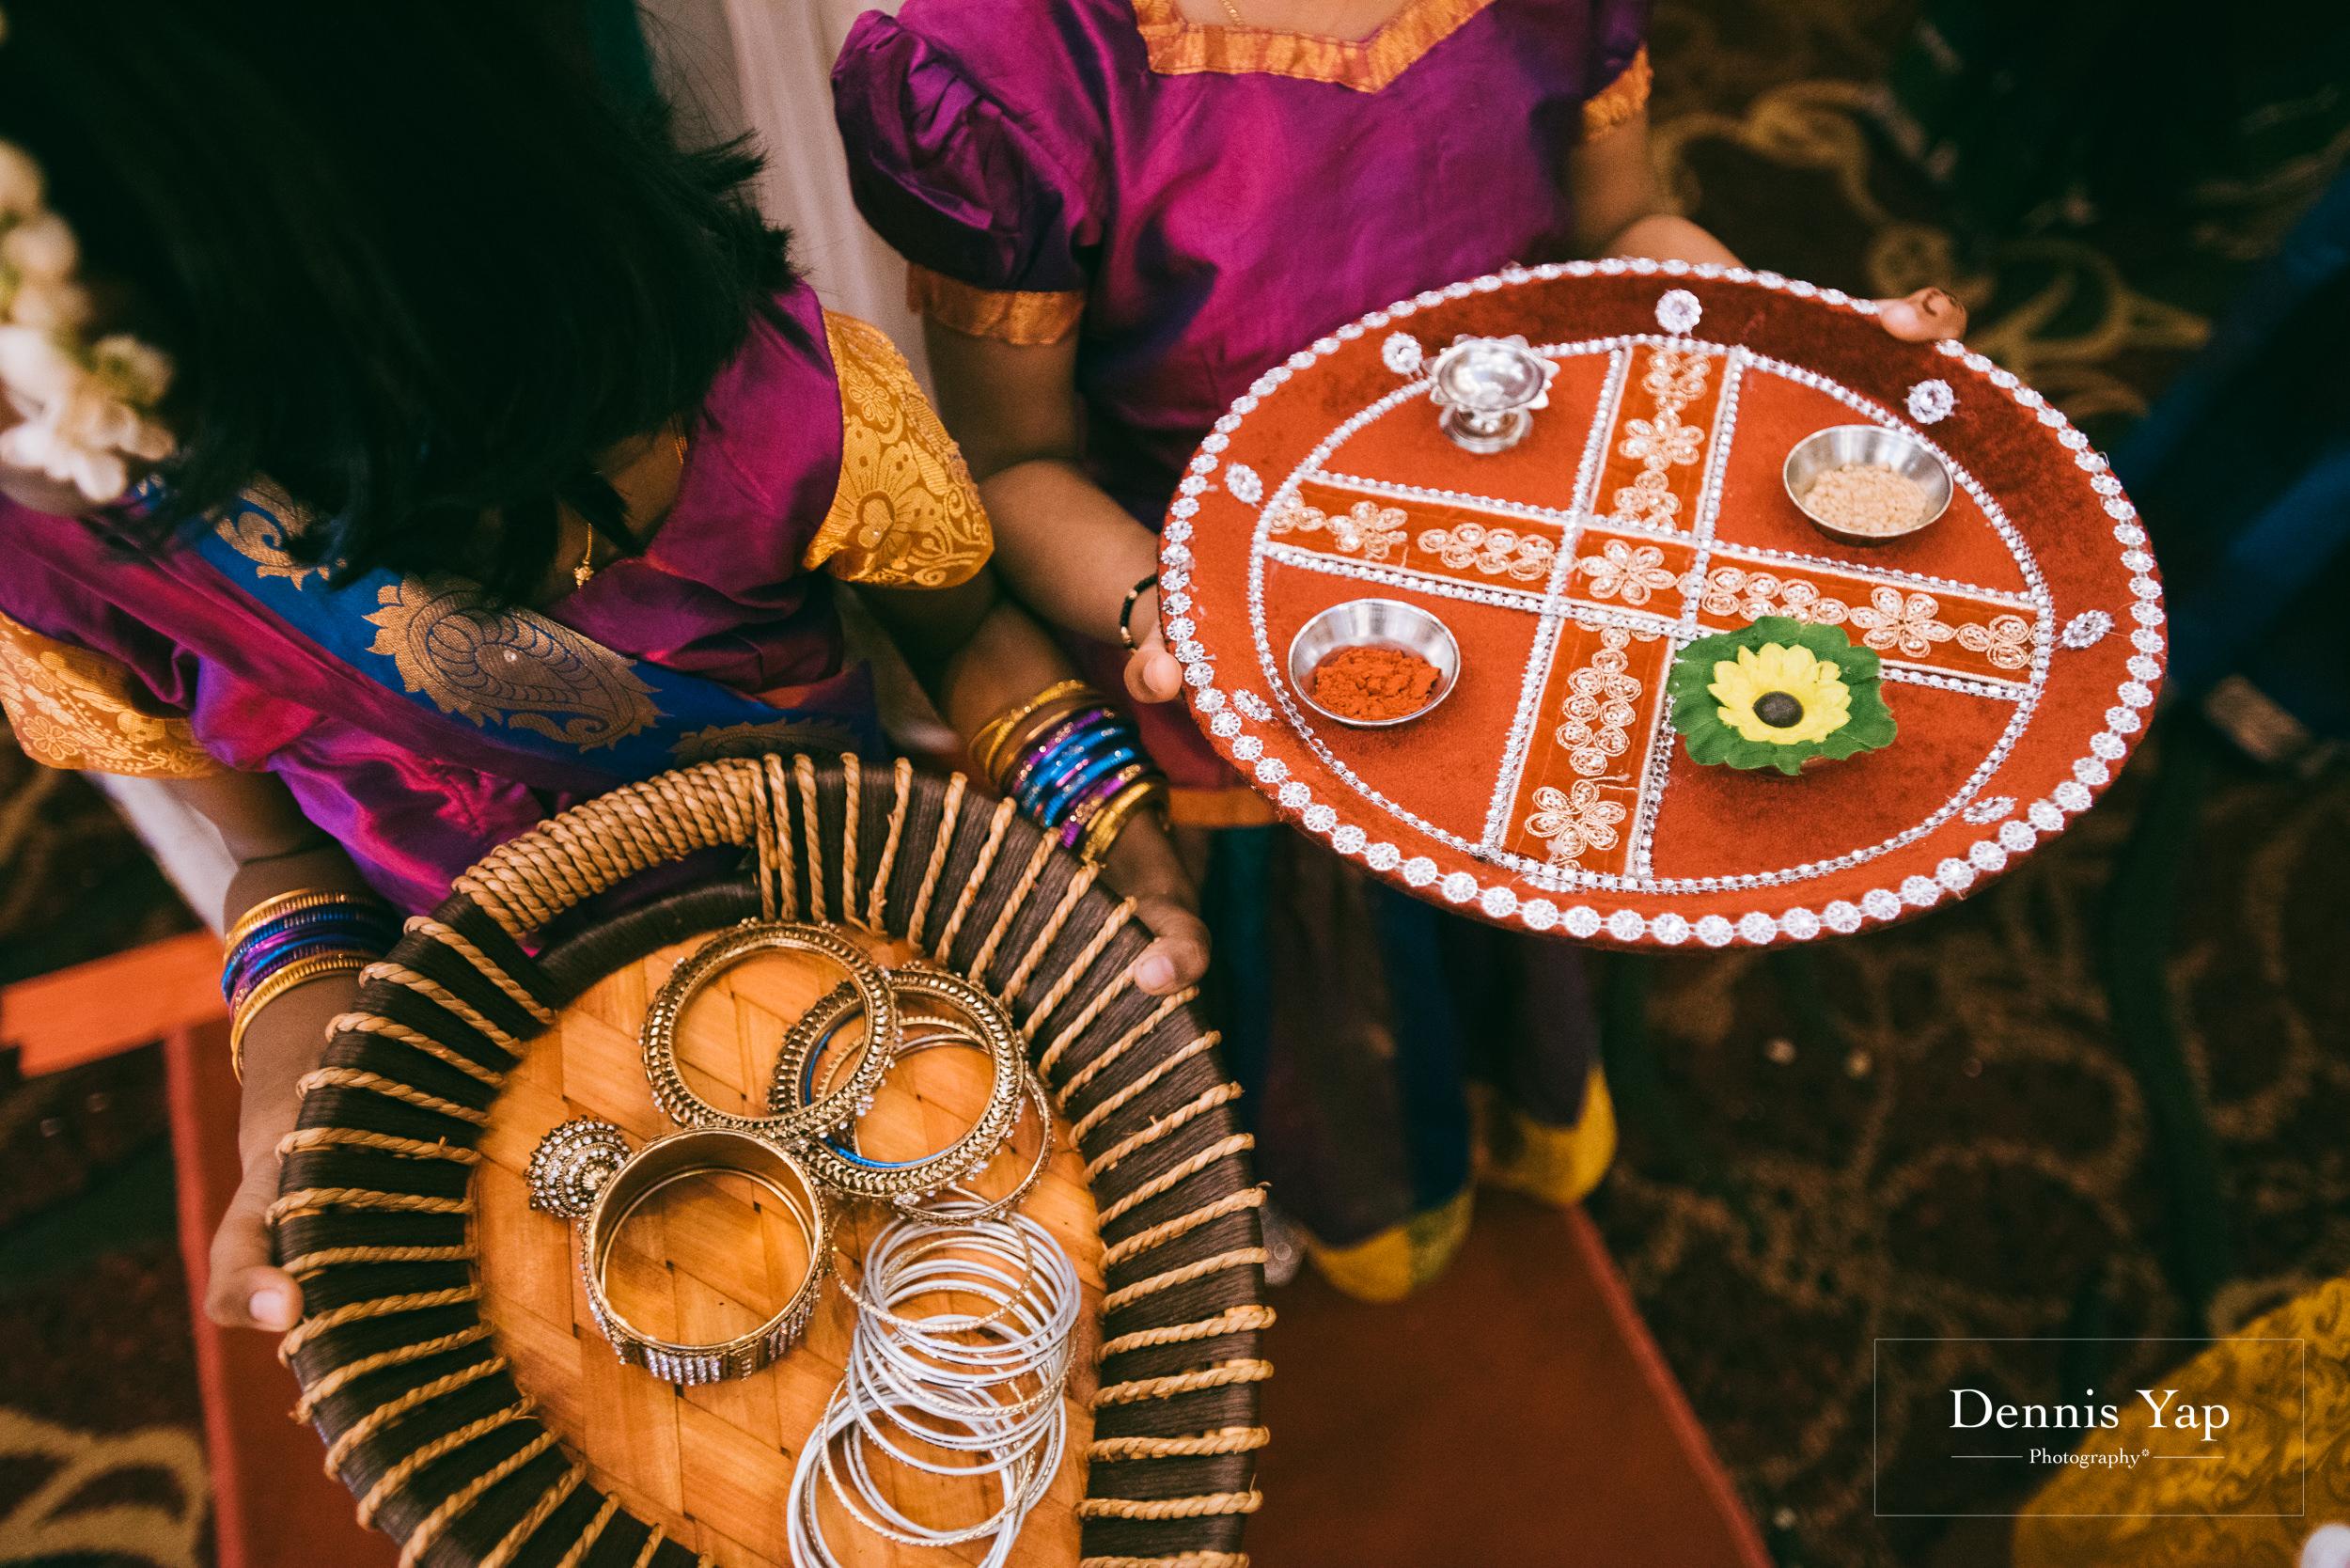 puvaneswaran cangitaa indian wedding ceremony ideal convention dennis yap photography malaysia-20.jpg